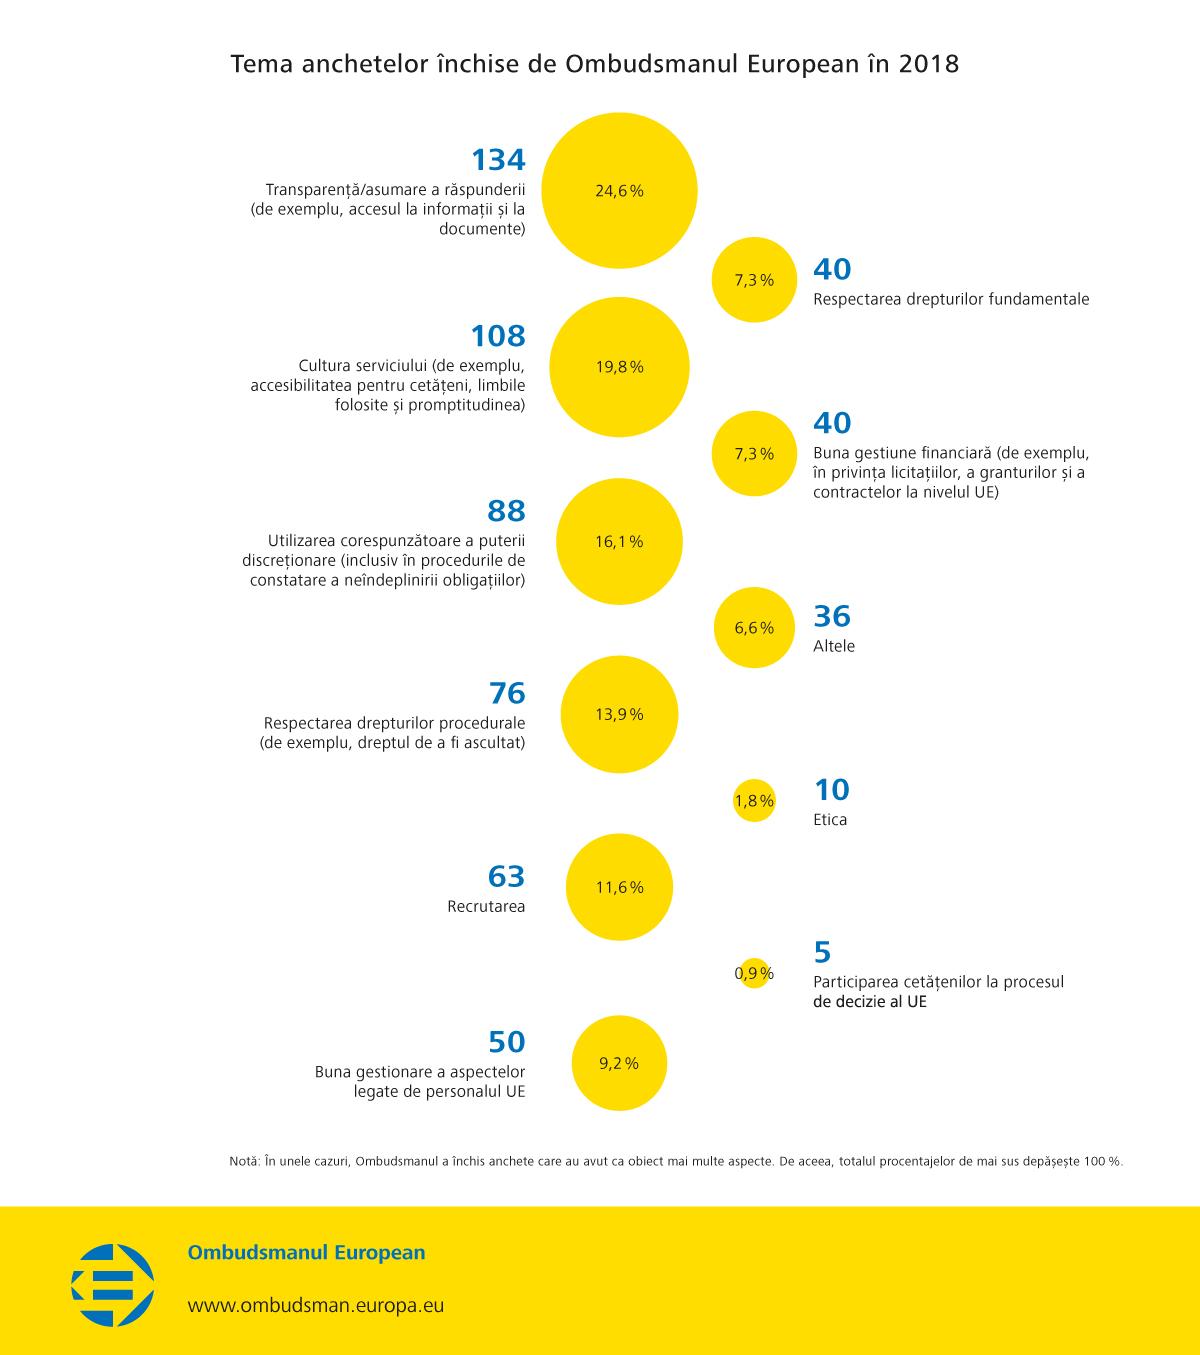 Tema anchetelor închise de Ombudsmanul European în 2018